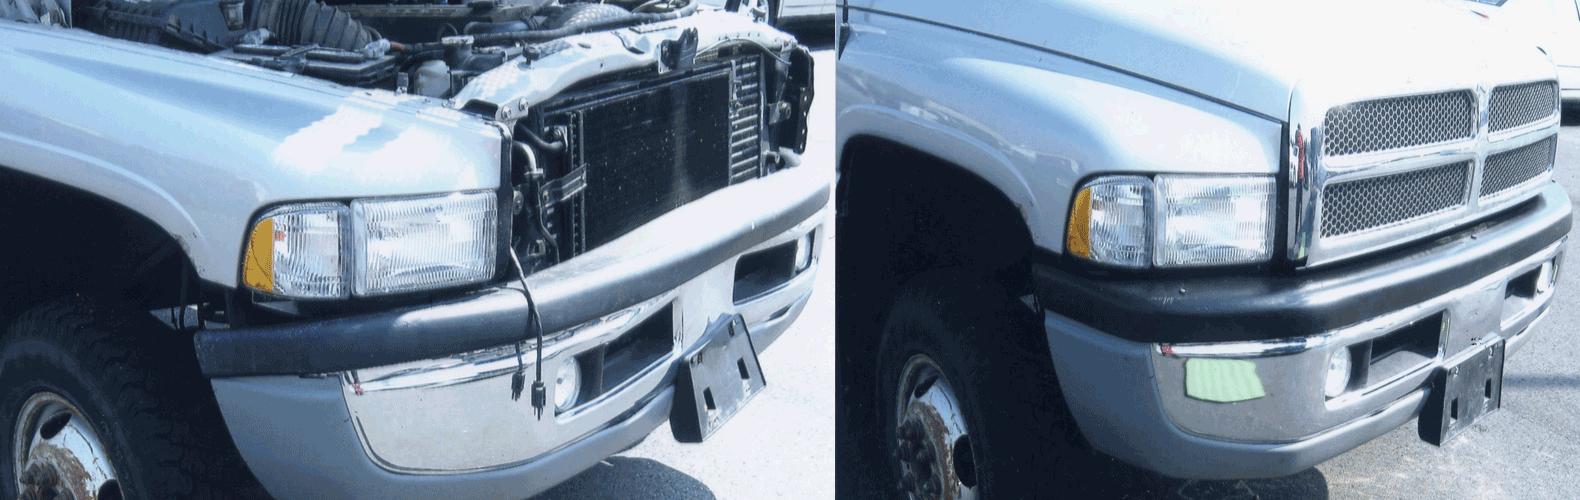 fast bumper repair service mobile to you